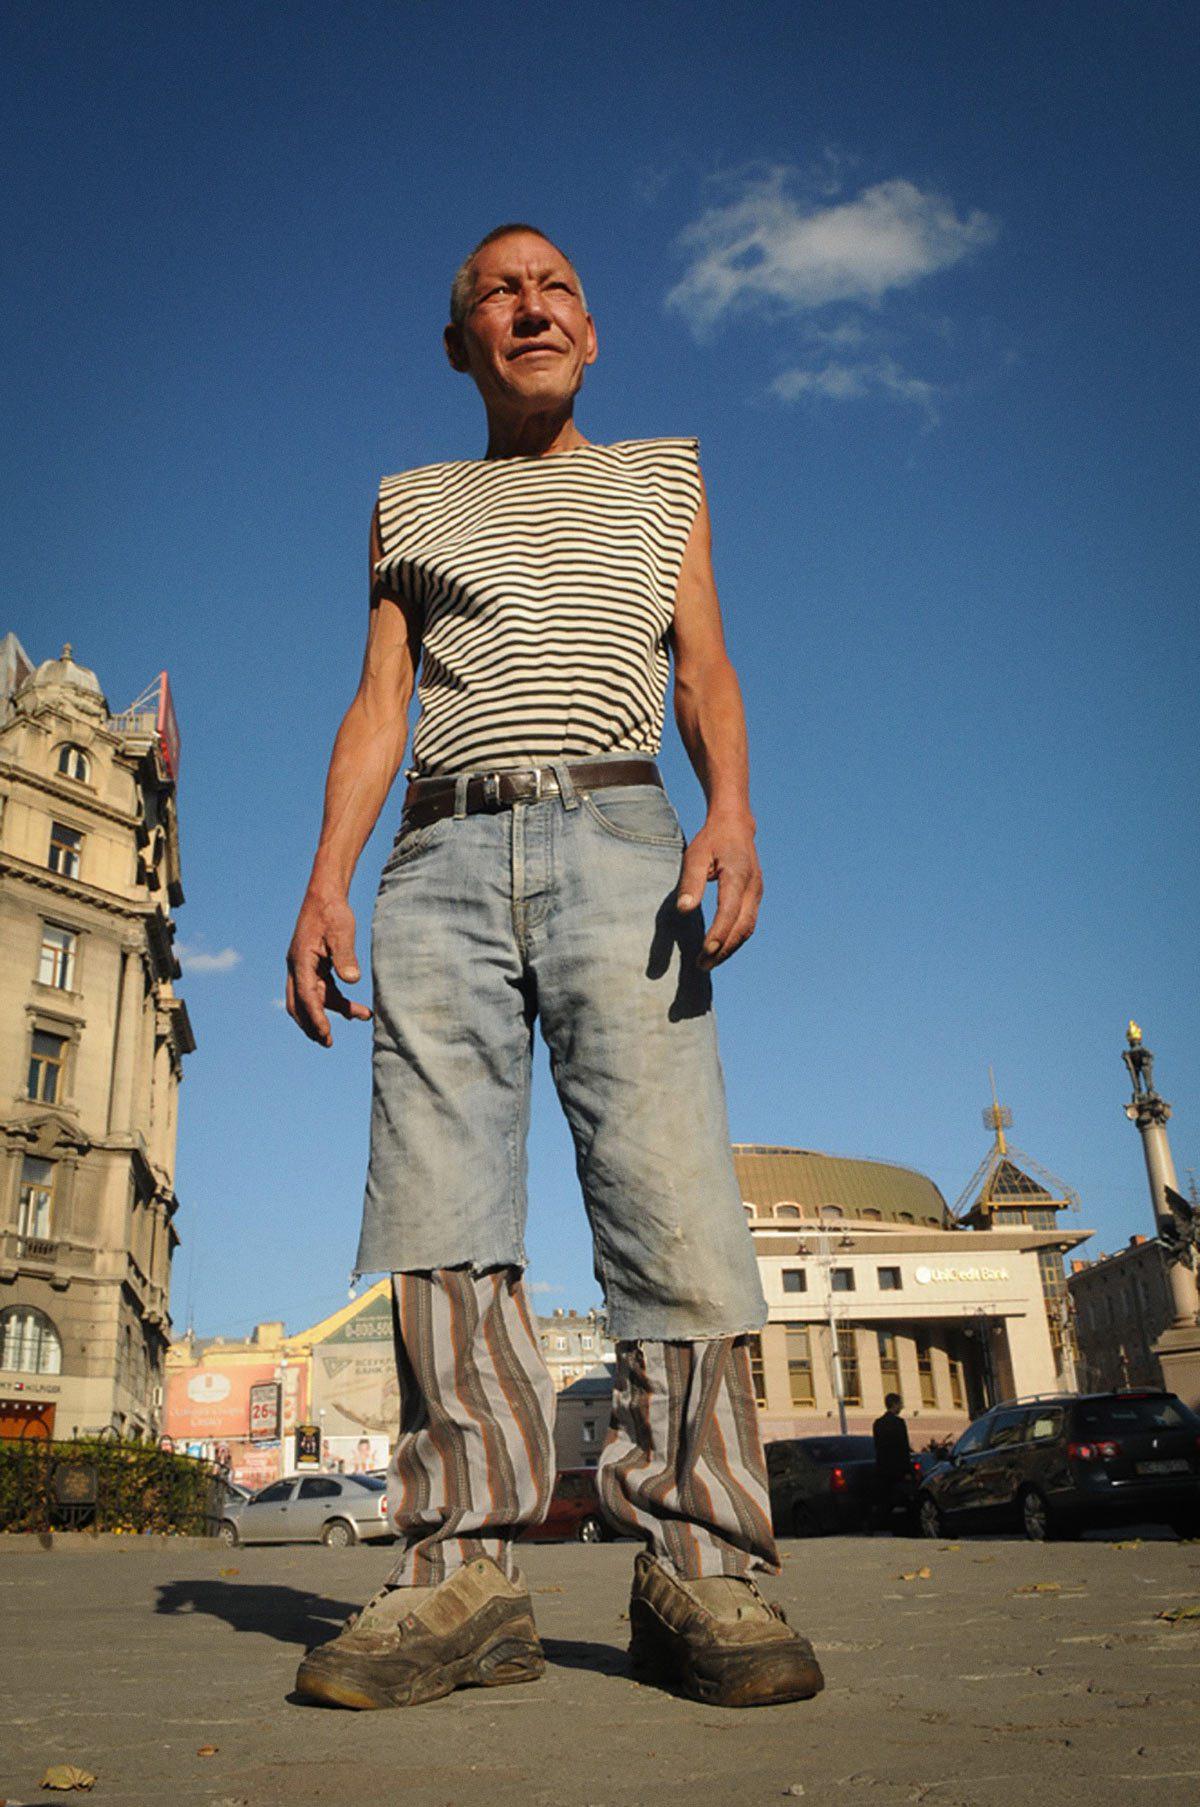 slaviks fashion fb 30 - <b>Мода Славика.</b> Фотосерия о львовском бездомном — в «Уровне цензуры» - Заборона